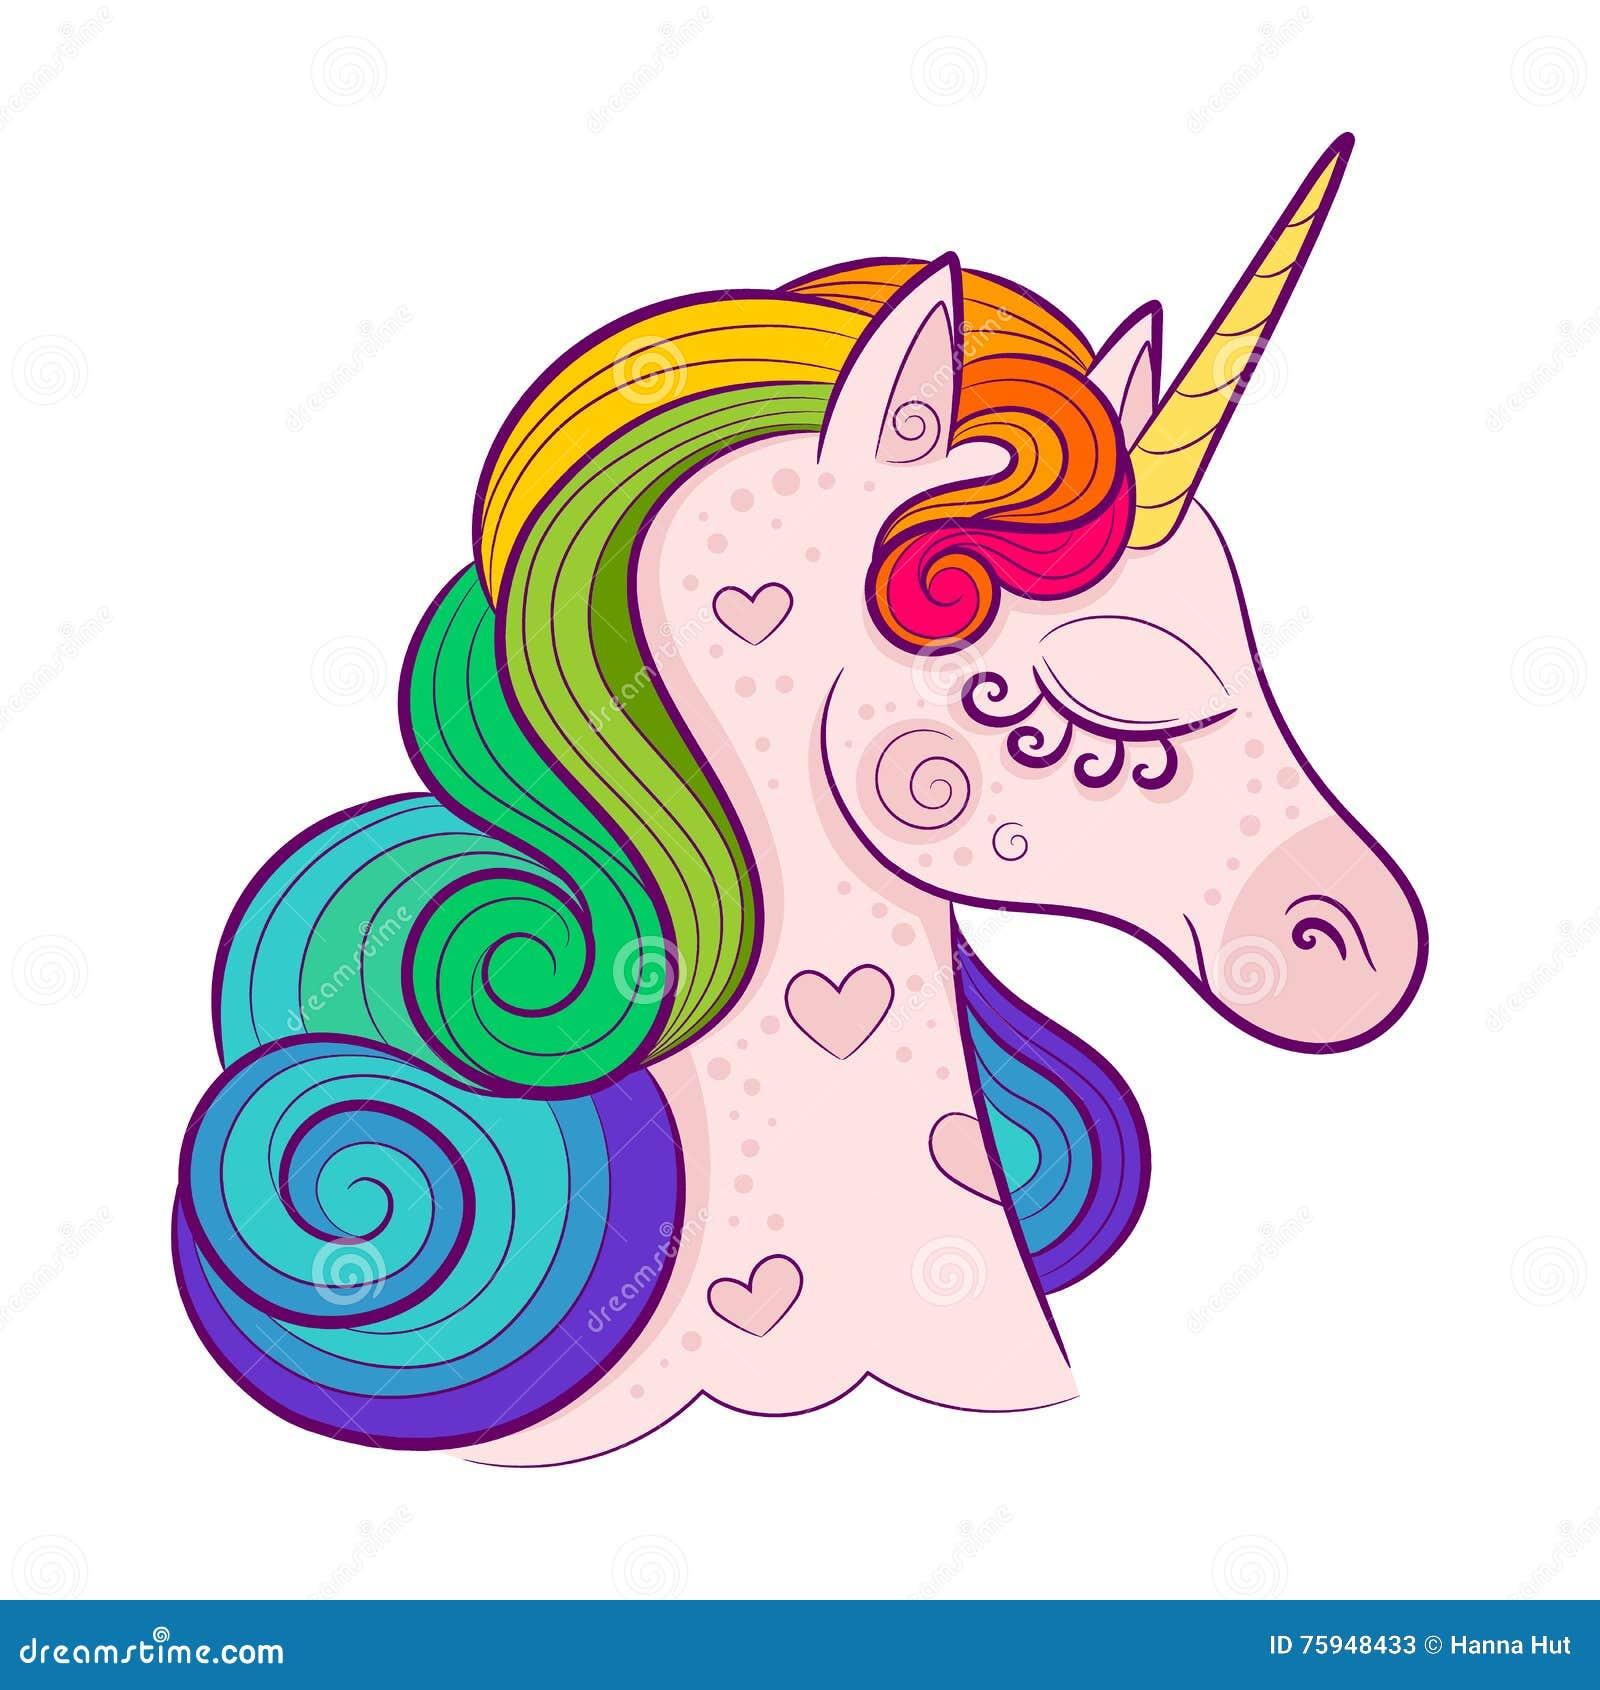 Head of cute white unicorn with rainbow mane isolated on white background